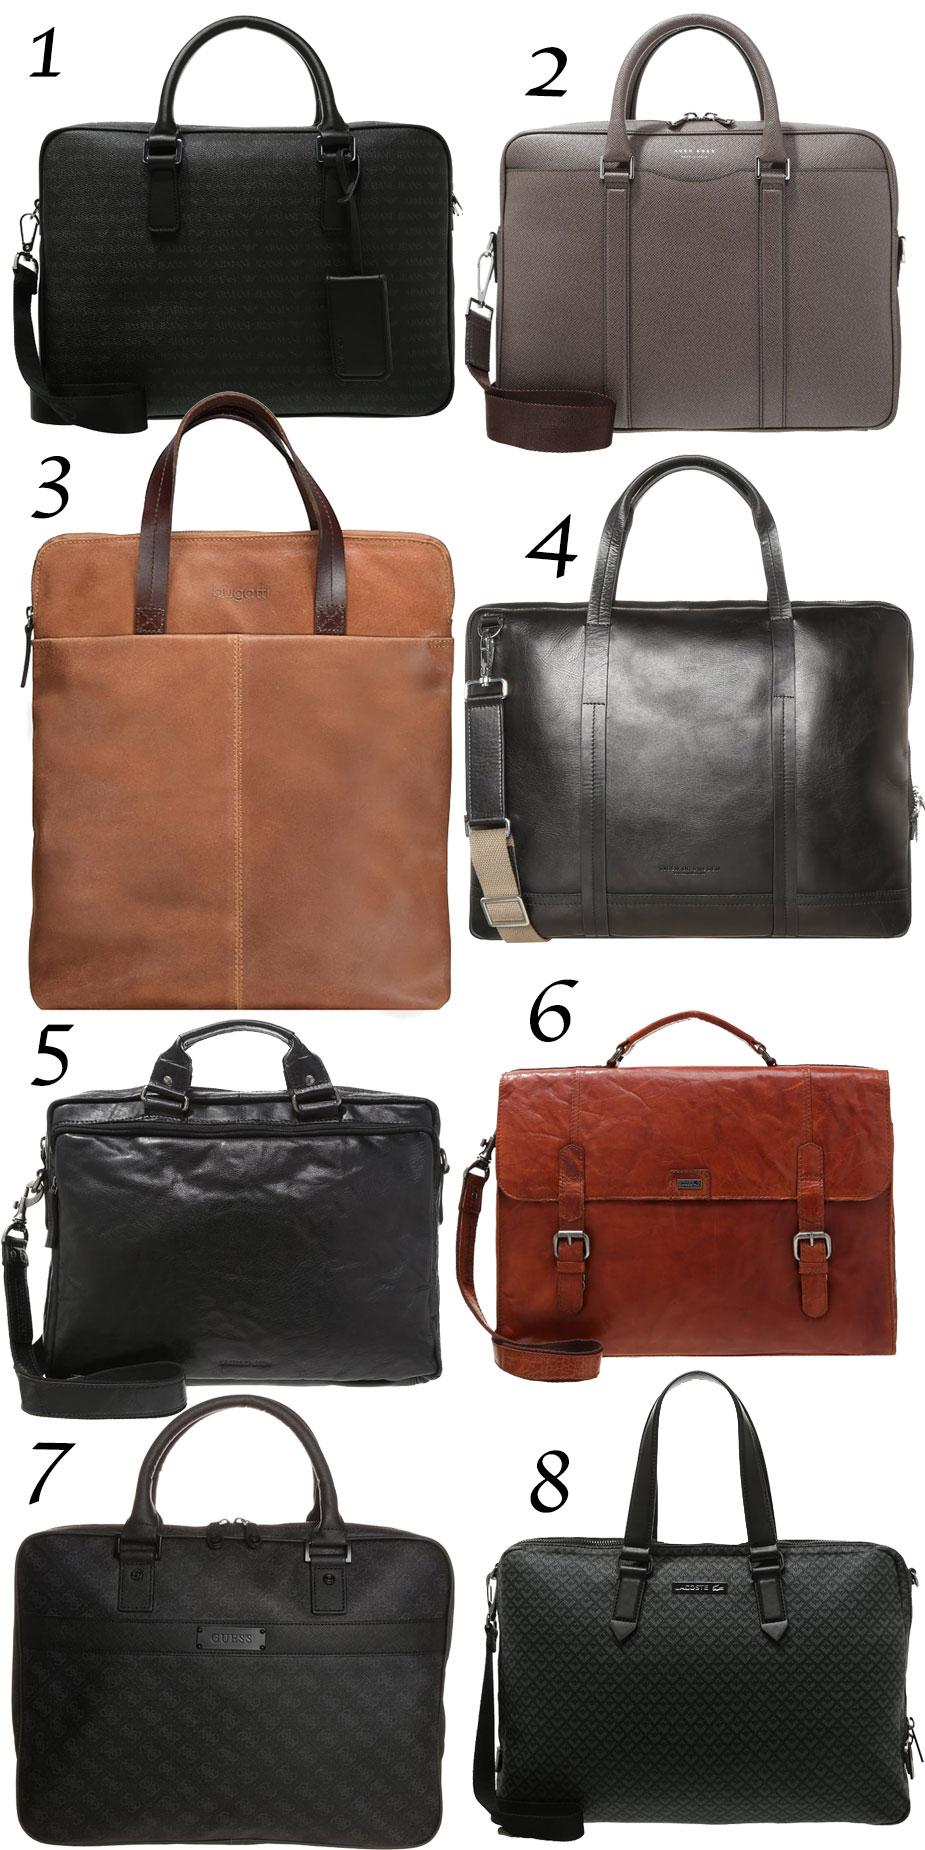 Männer Handtaschen 2016